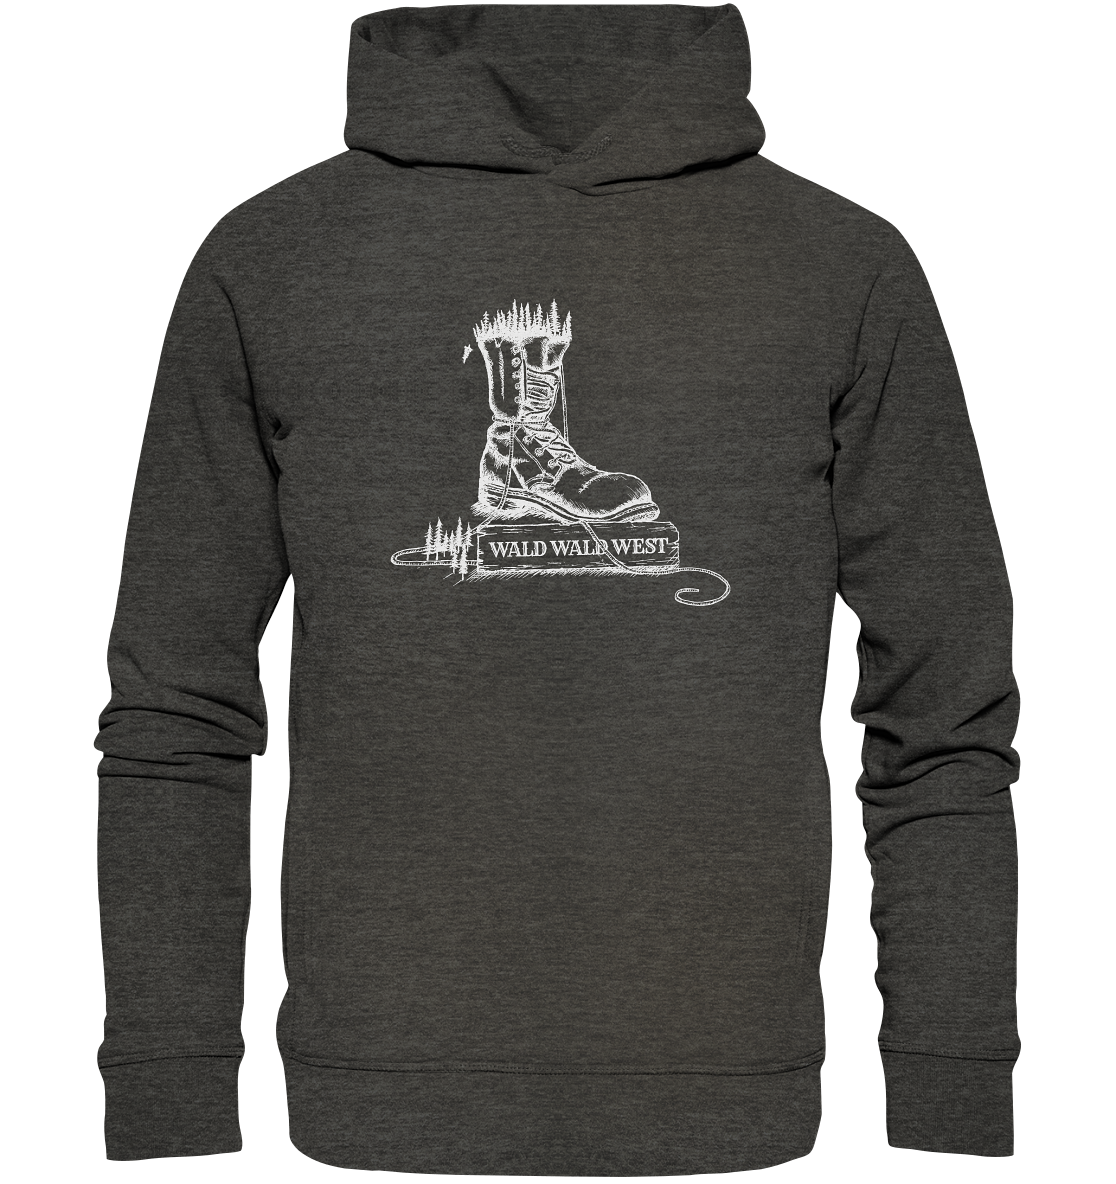 front-organic-fashion-hoodie-252625-1116x.png